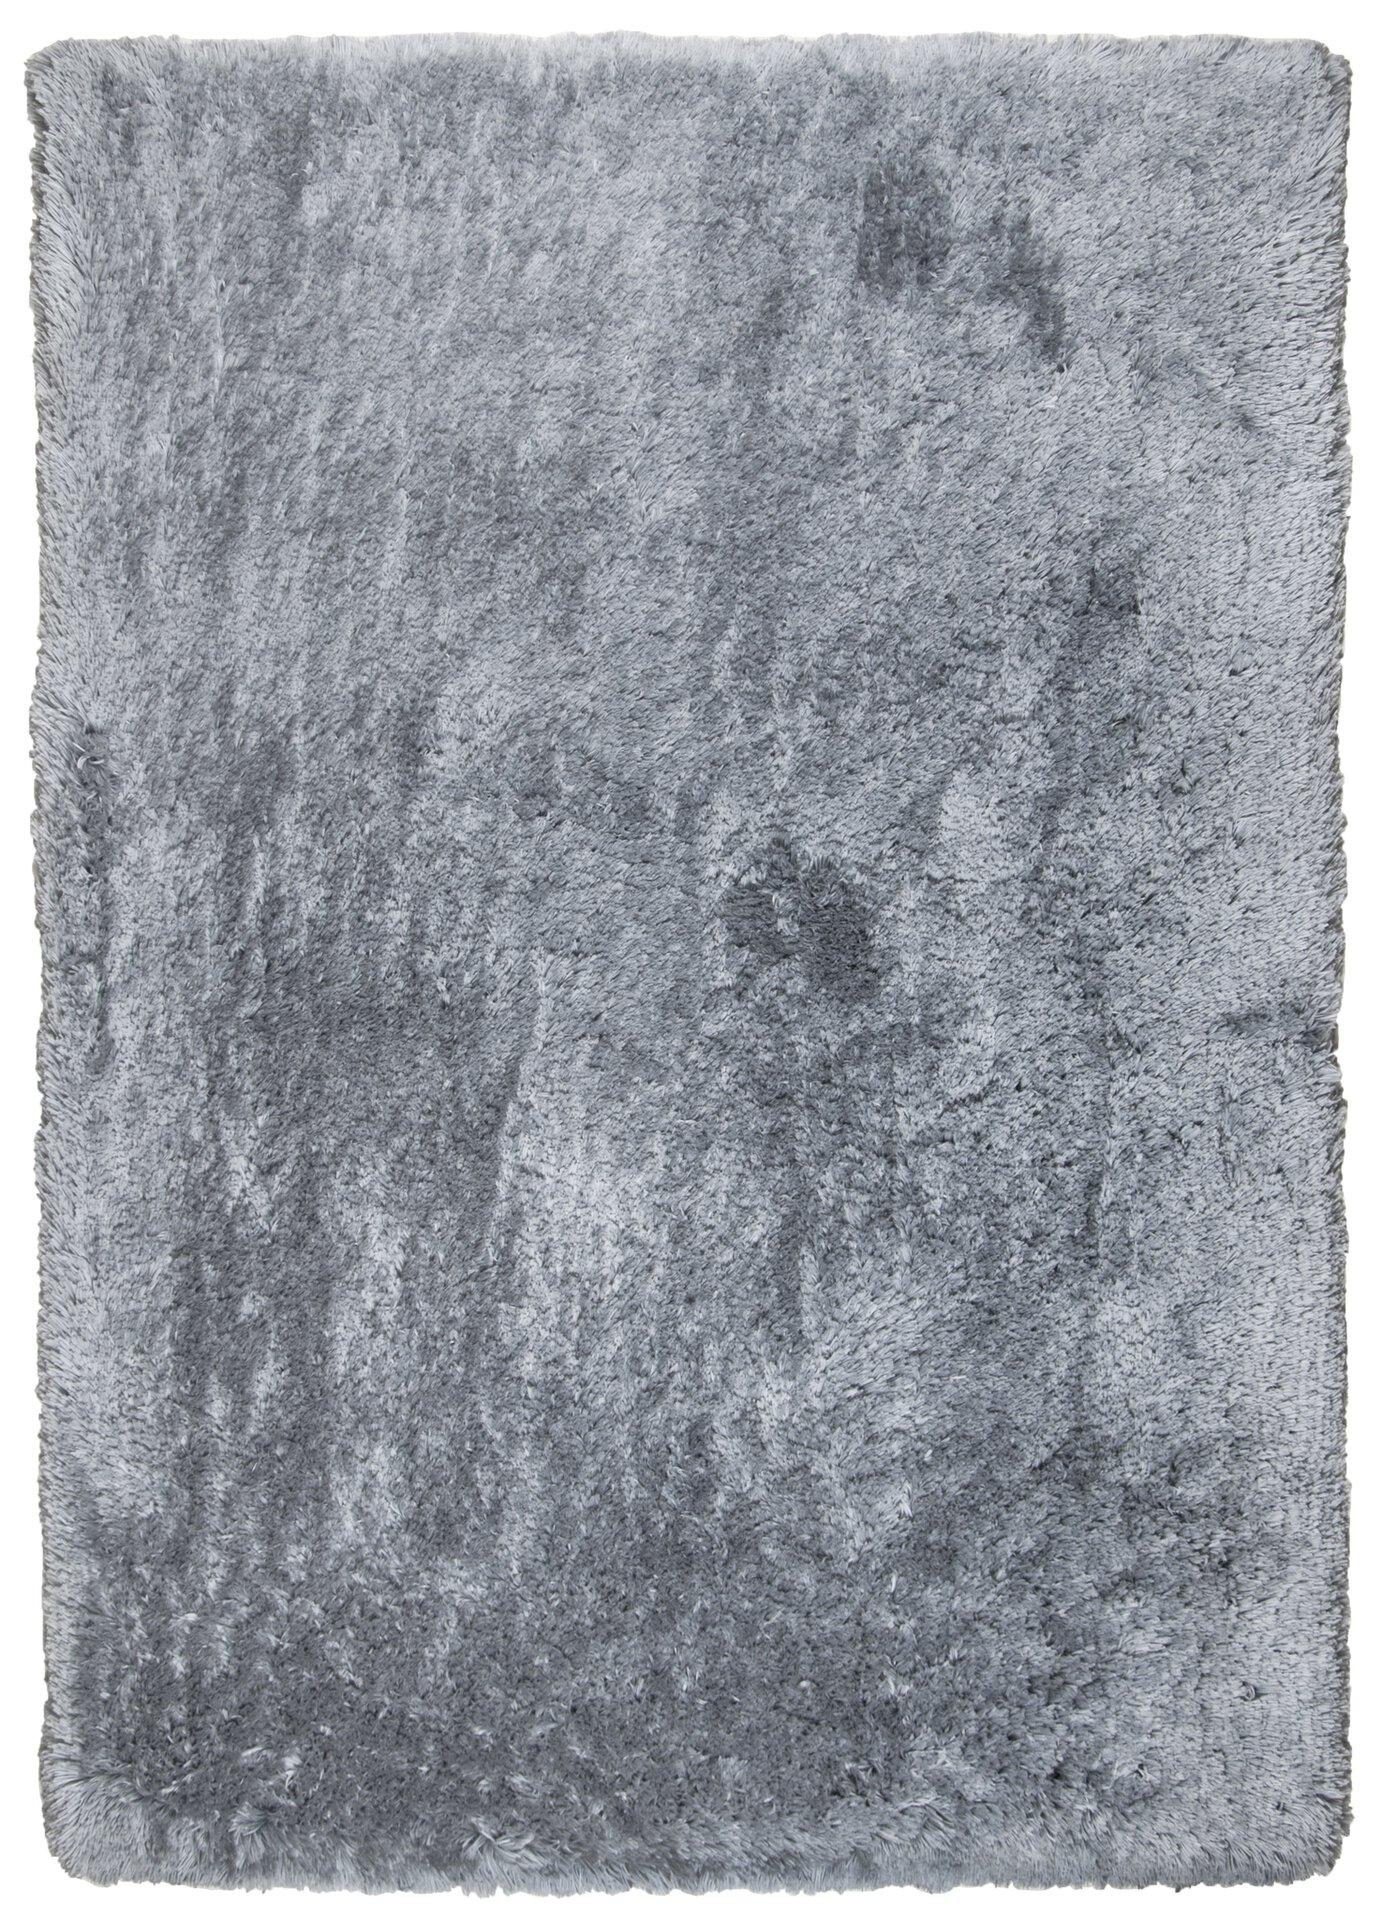 Handtuftteppich Flokato Theko Textil grau